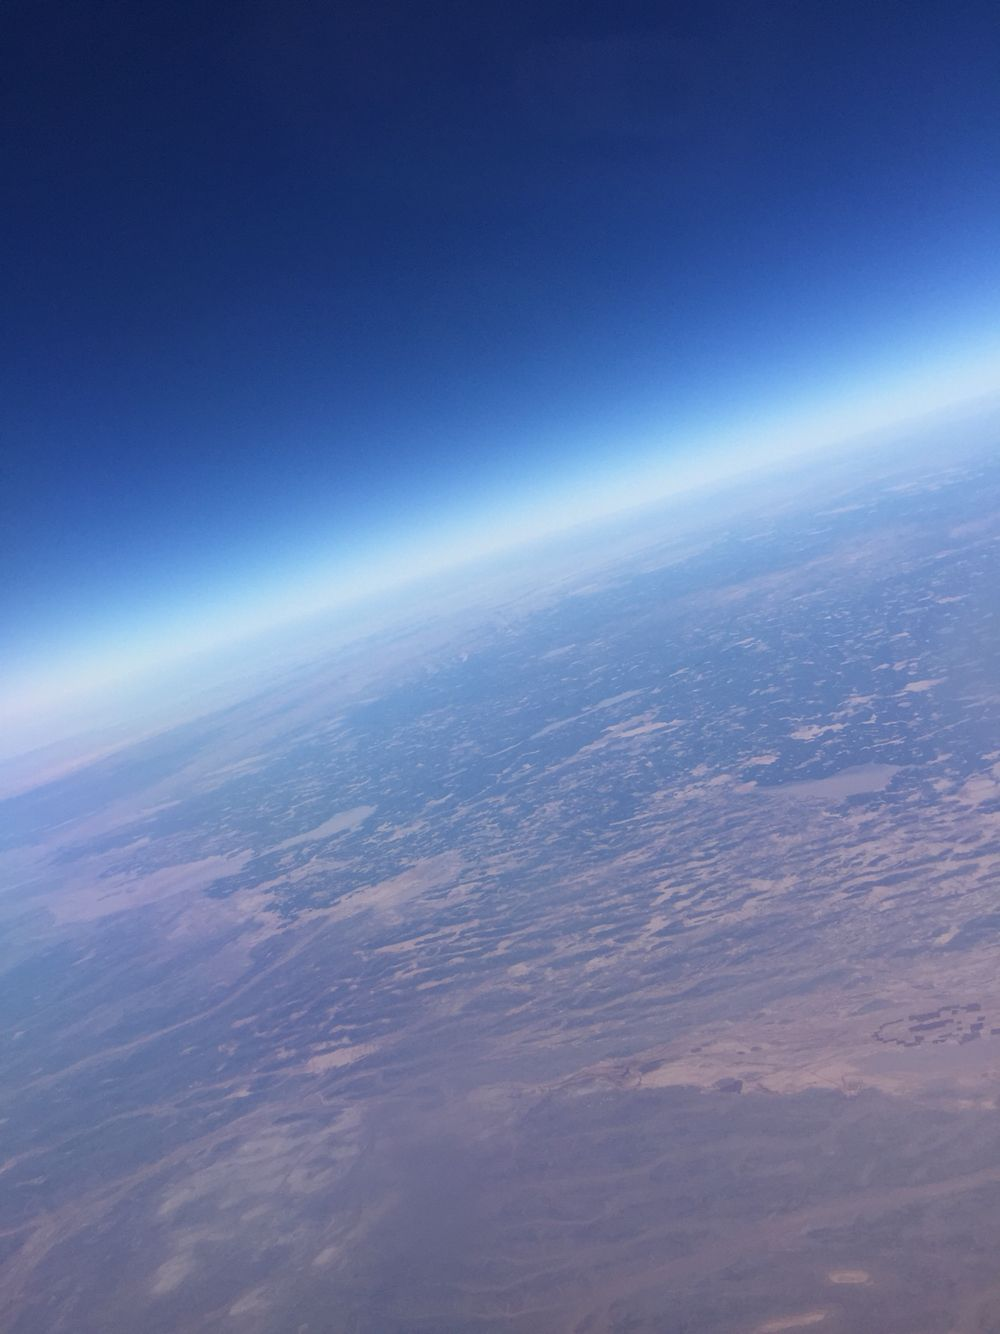 Jordan sky #middleeast#airplane